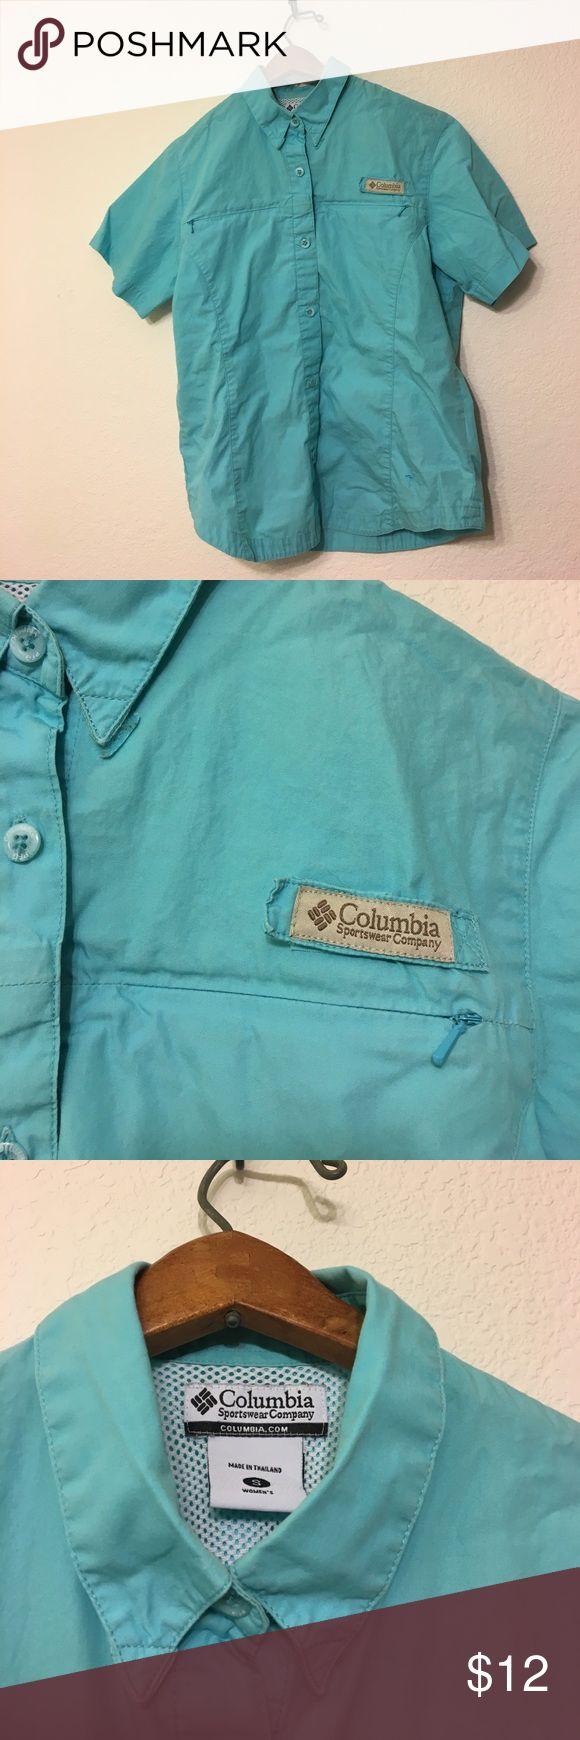 Columbia Women's Small Button Up Shirt Lightweight Columbia fishing shirt great for outdoor activities! Columbia Tops Button Down Shirts